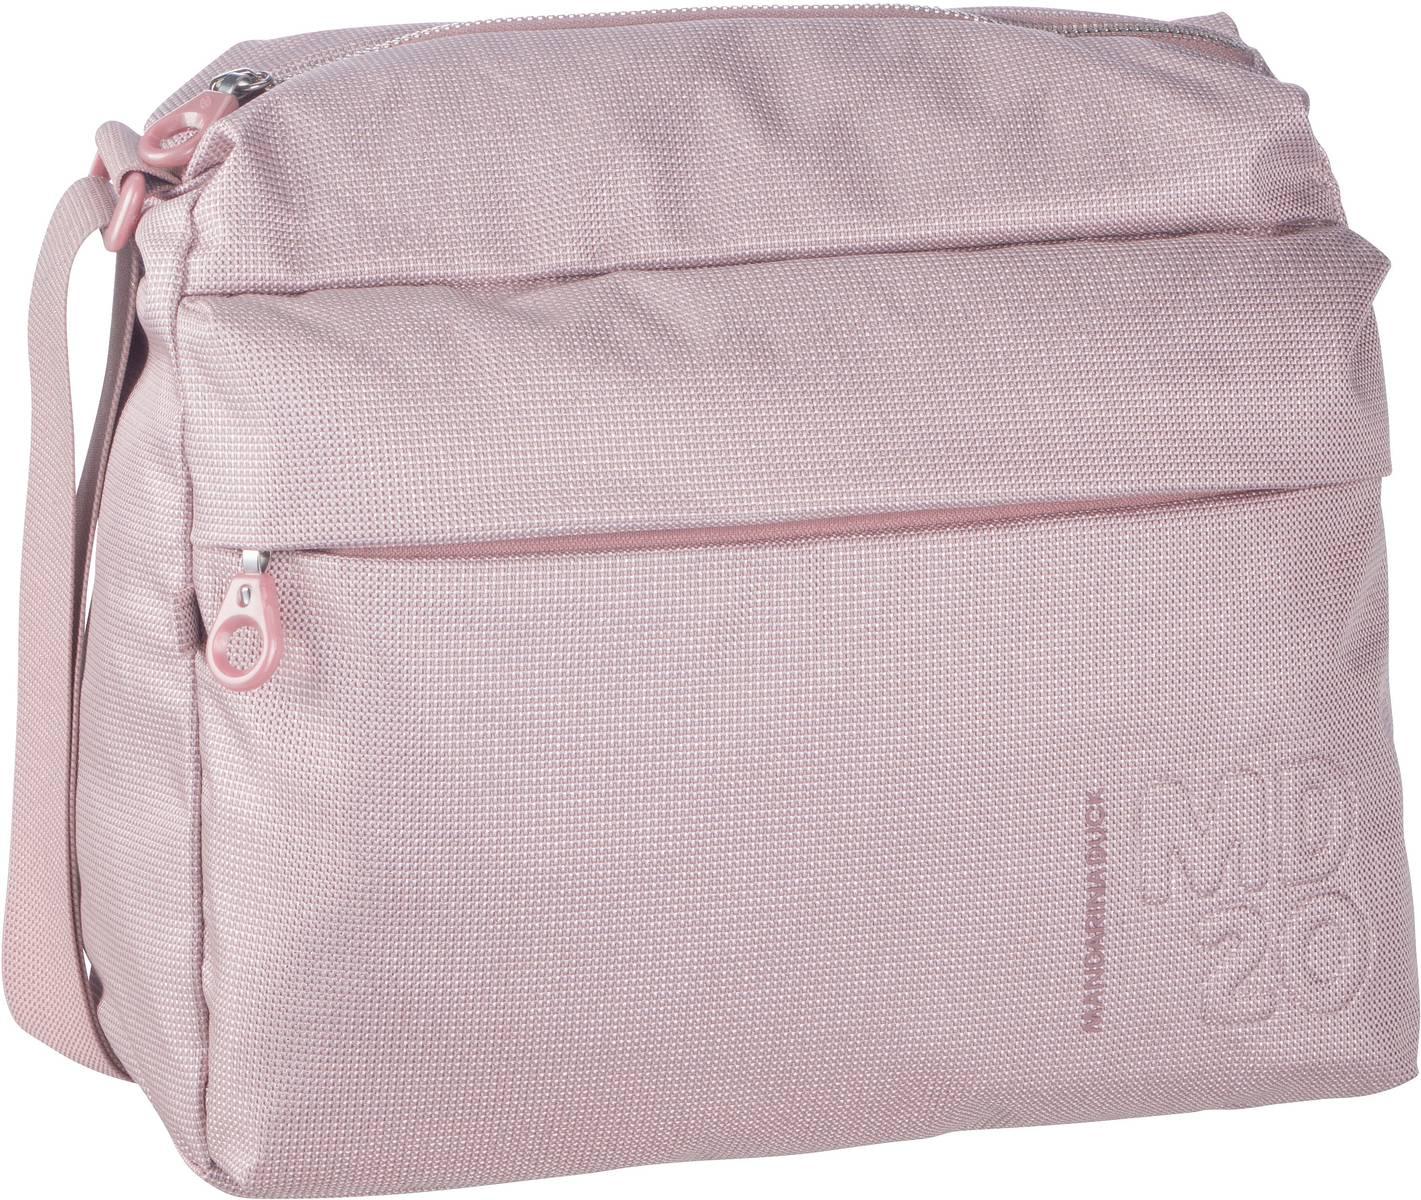 Umhängetasche MD20 Lux Crossover Bag QNTT4 Magnolia